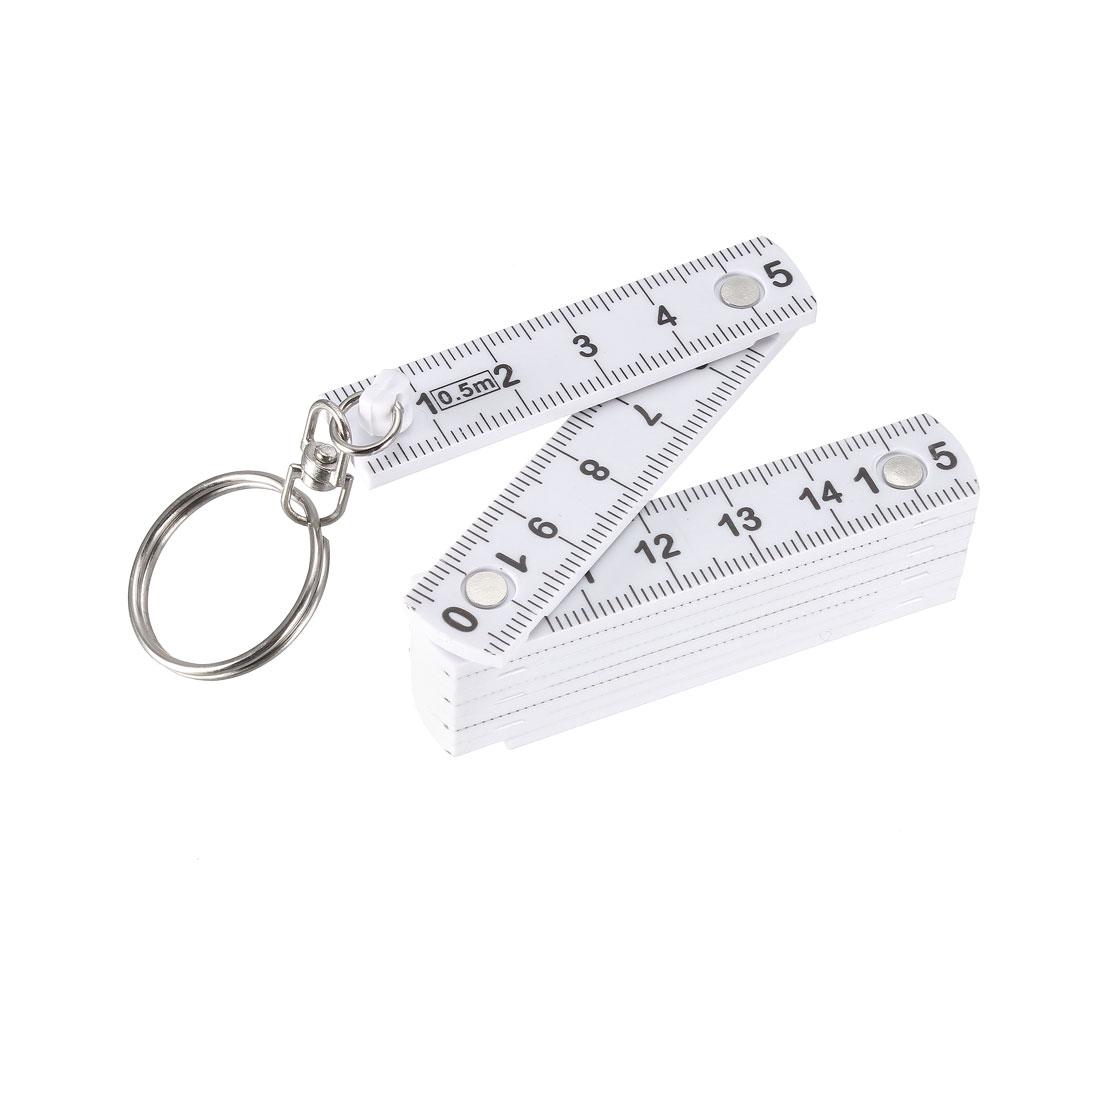 Folding Ruler 50cm 10 Fold Metric Measuring Tool Platic for Engineer White